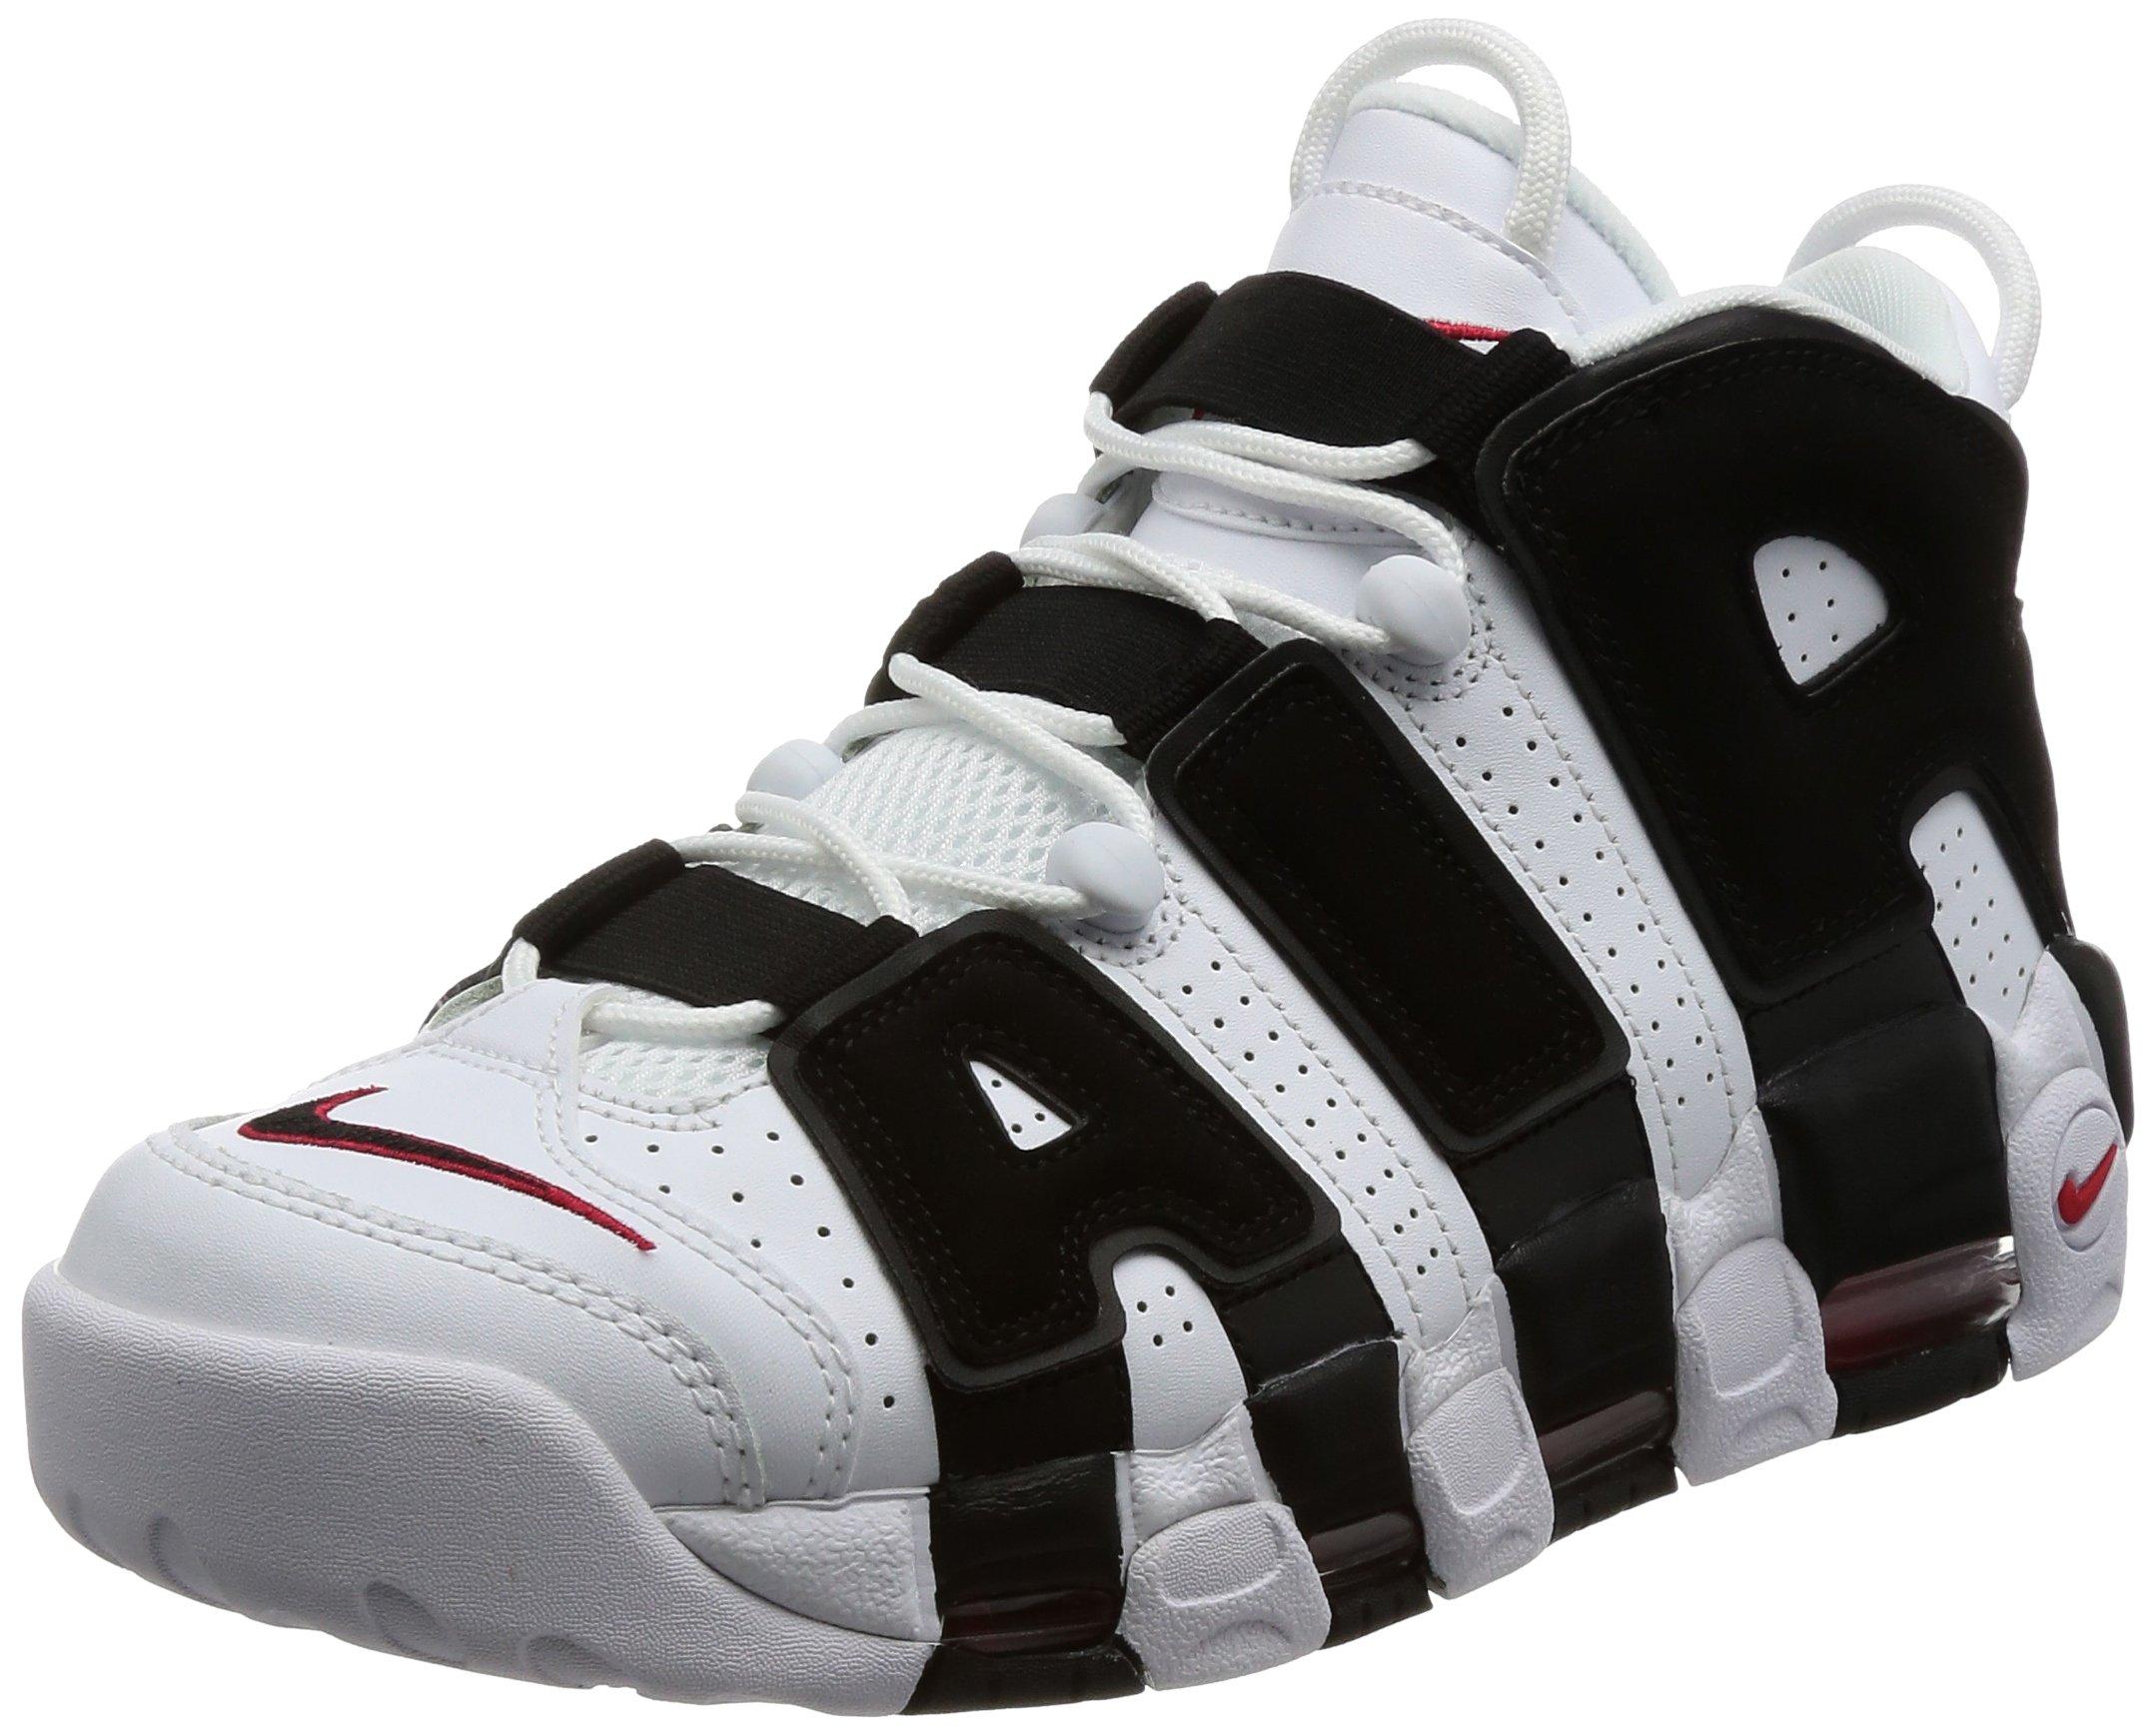 Nike Air More Uptempo Men's Shoe